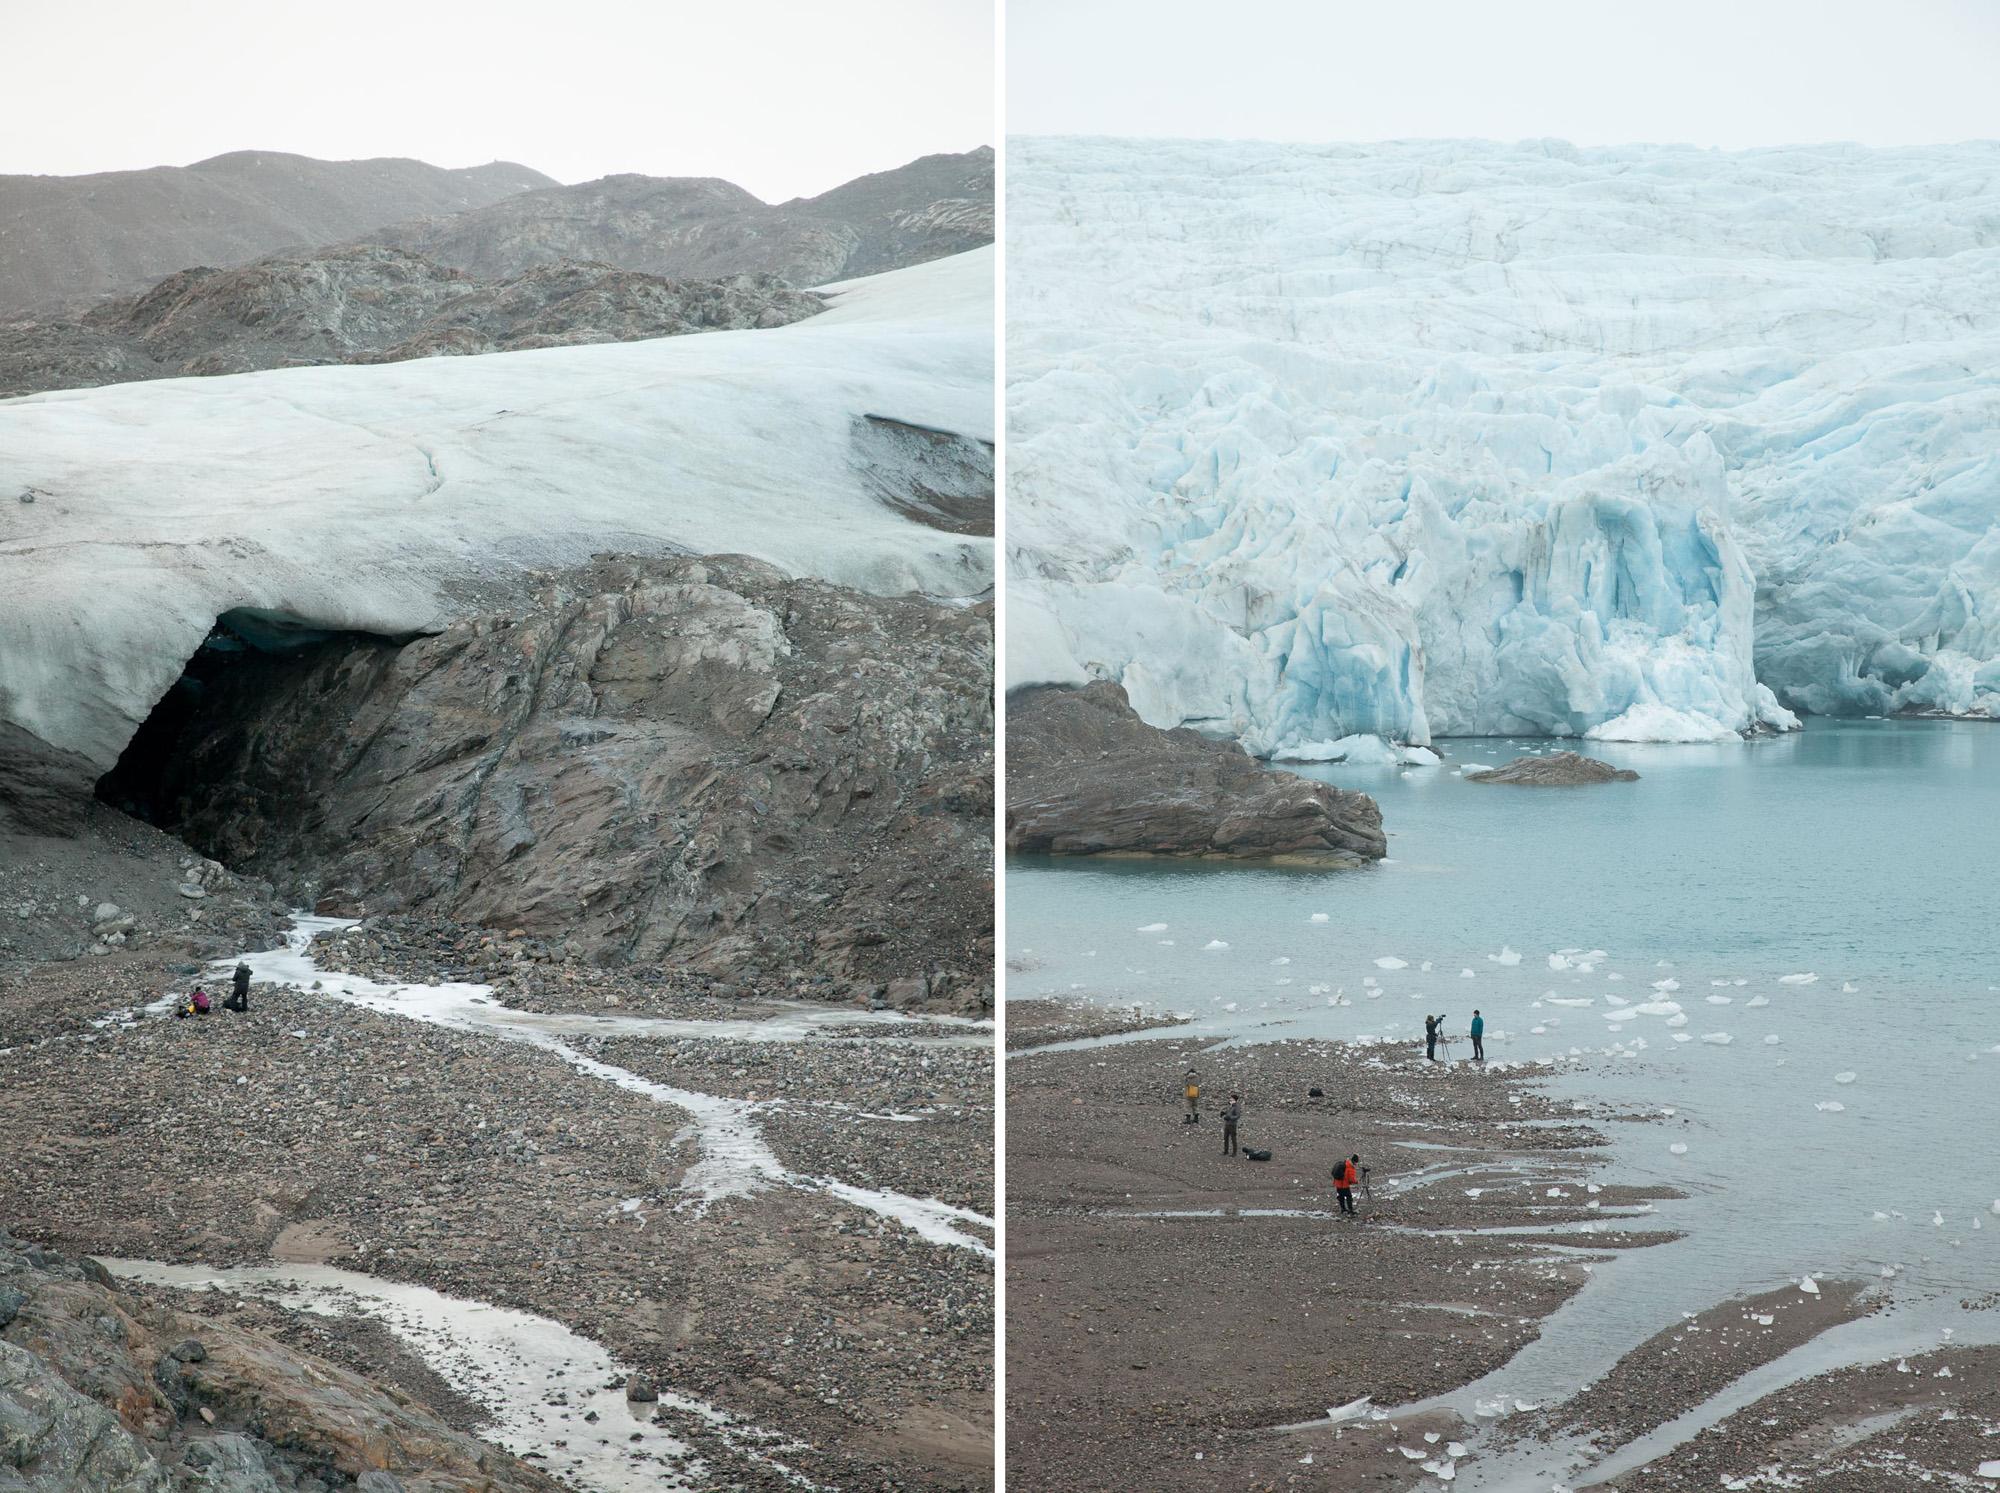 arctic-svalbard-06.jpg